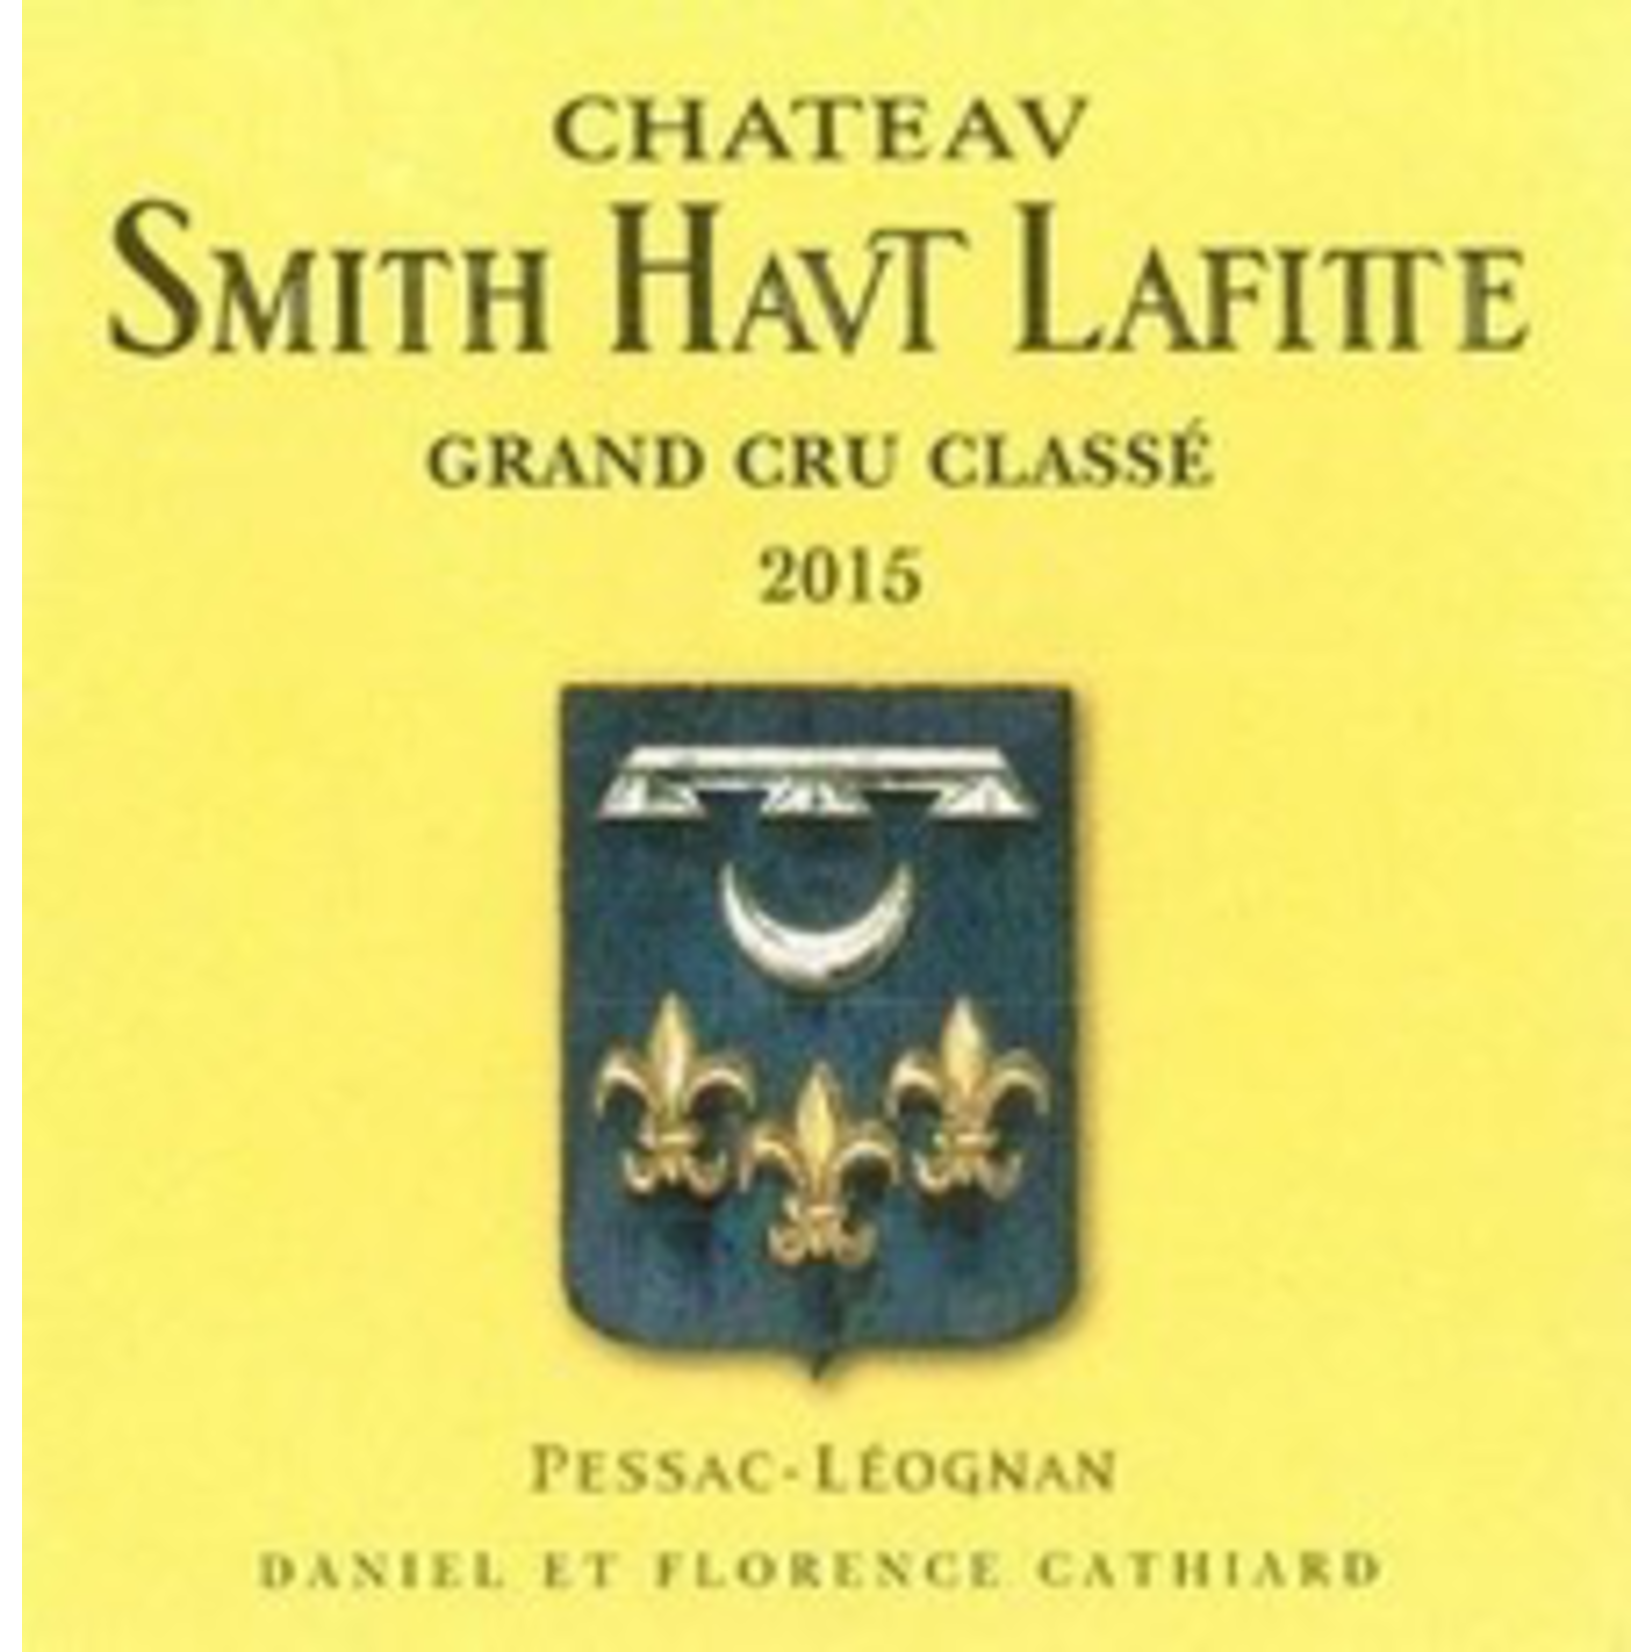 Wine Chateau Smith Haut Lafitte 2015